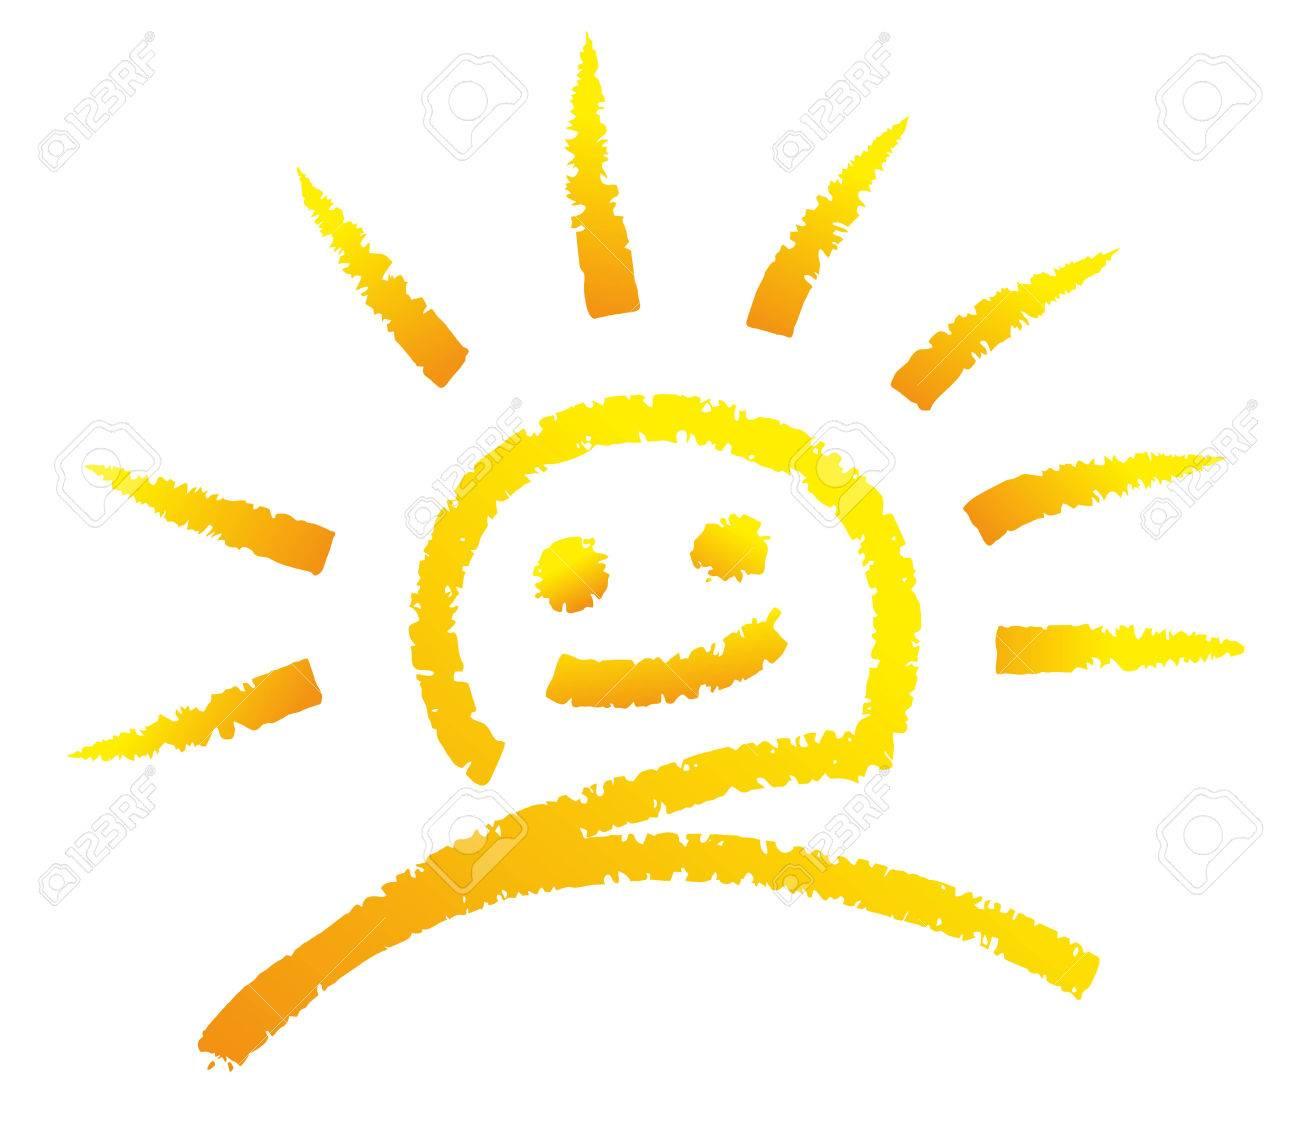 illustration of a sun drawn with chalk royalty free cliparts rh 123rf com Coffee Chalk Vector Free Download Coffee Chalk Vector Free Download